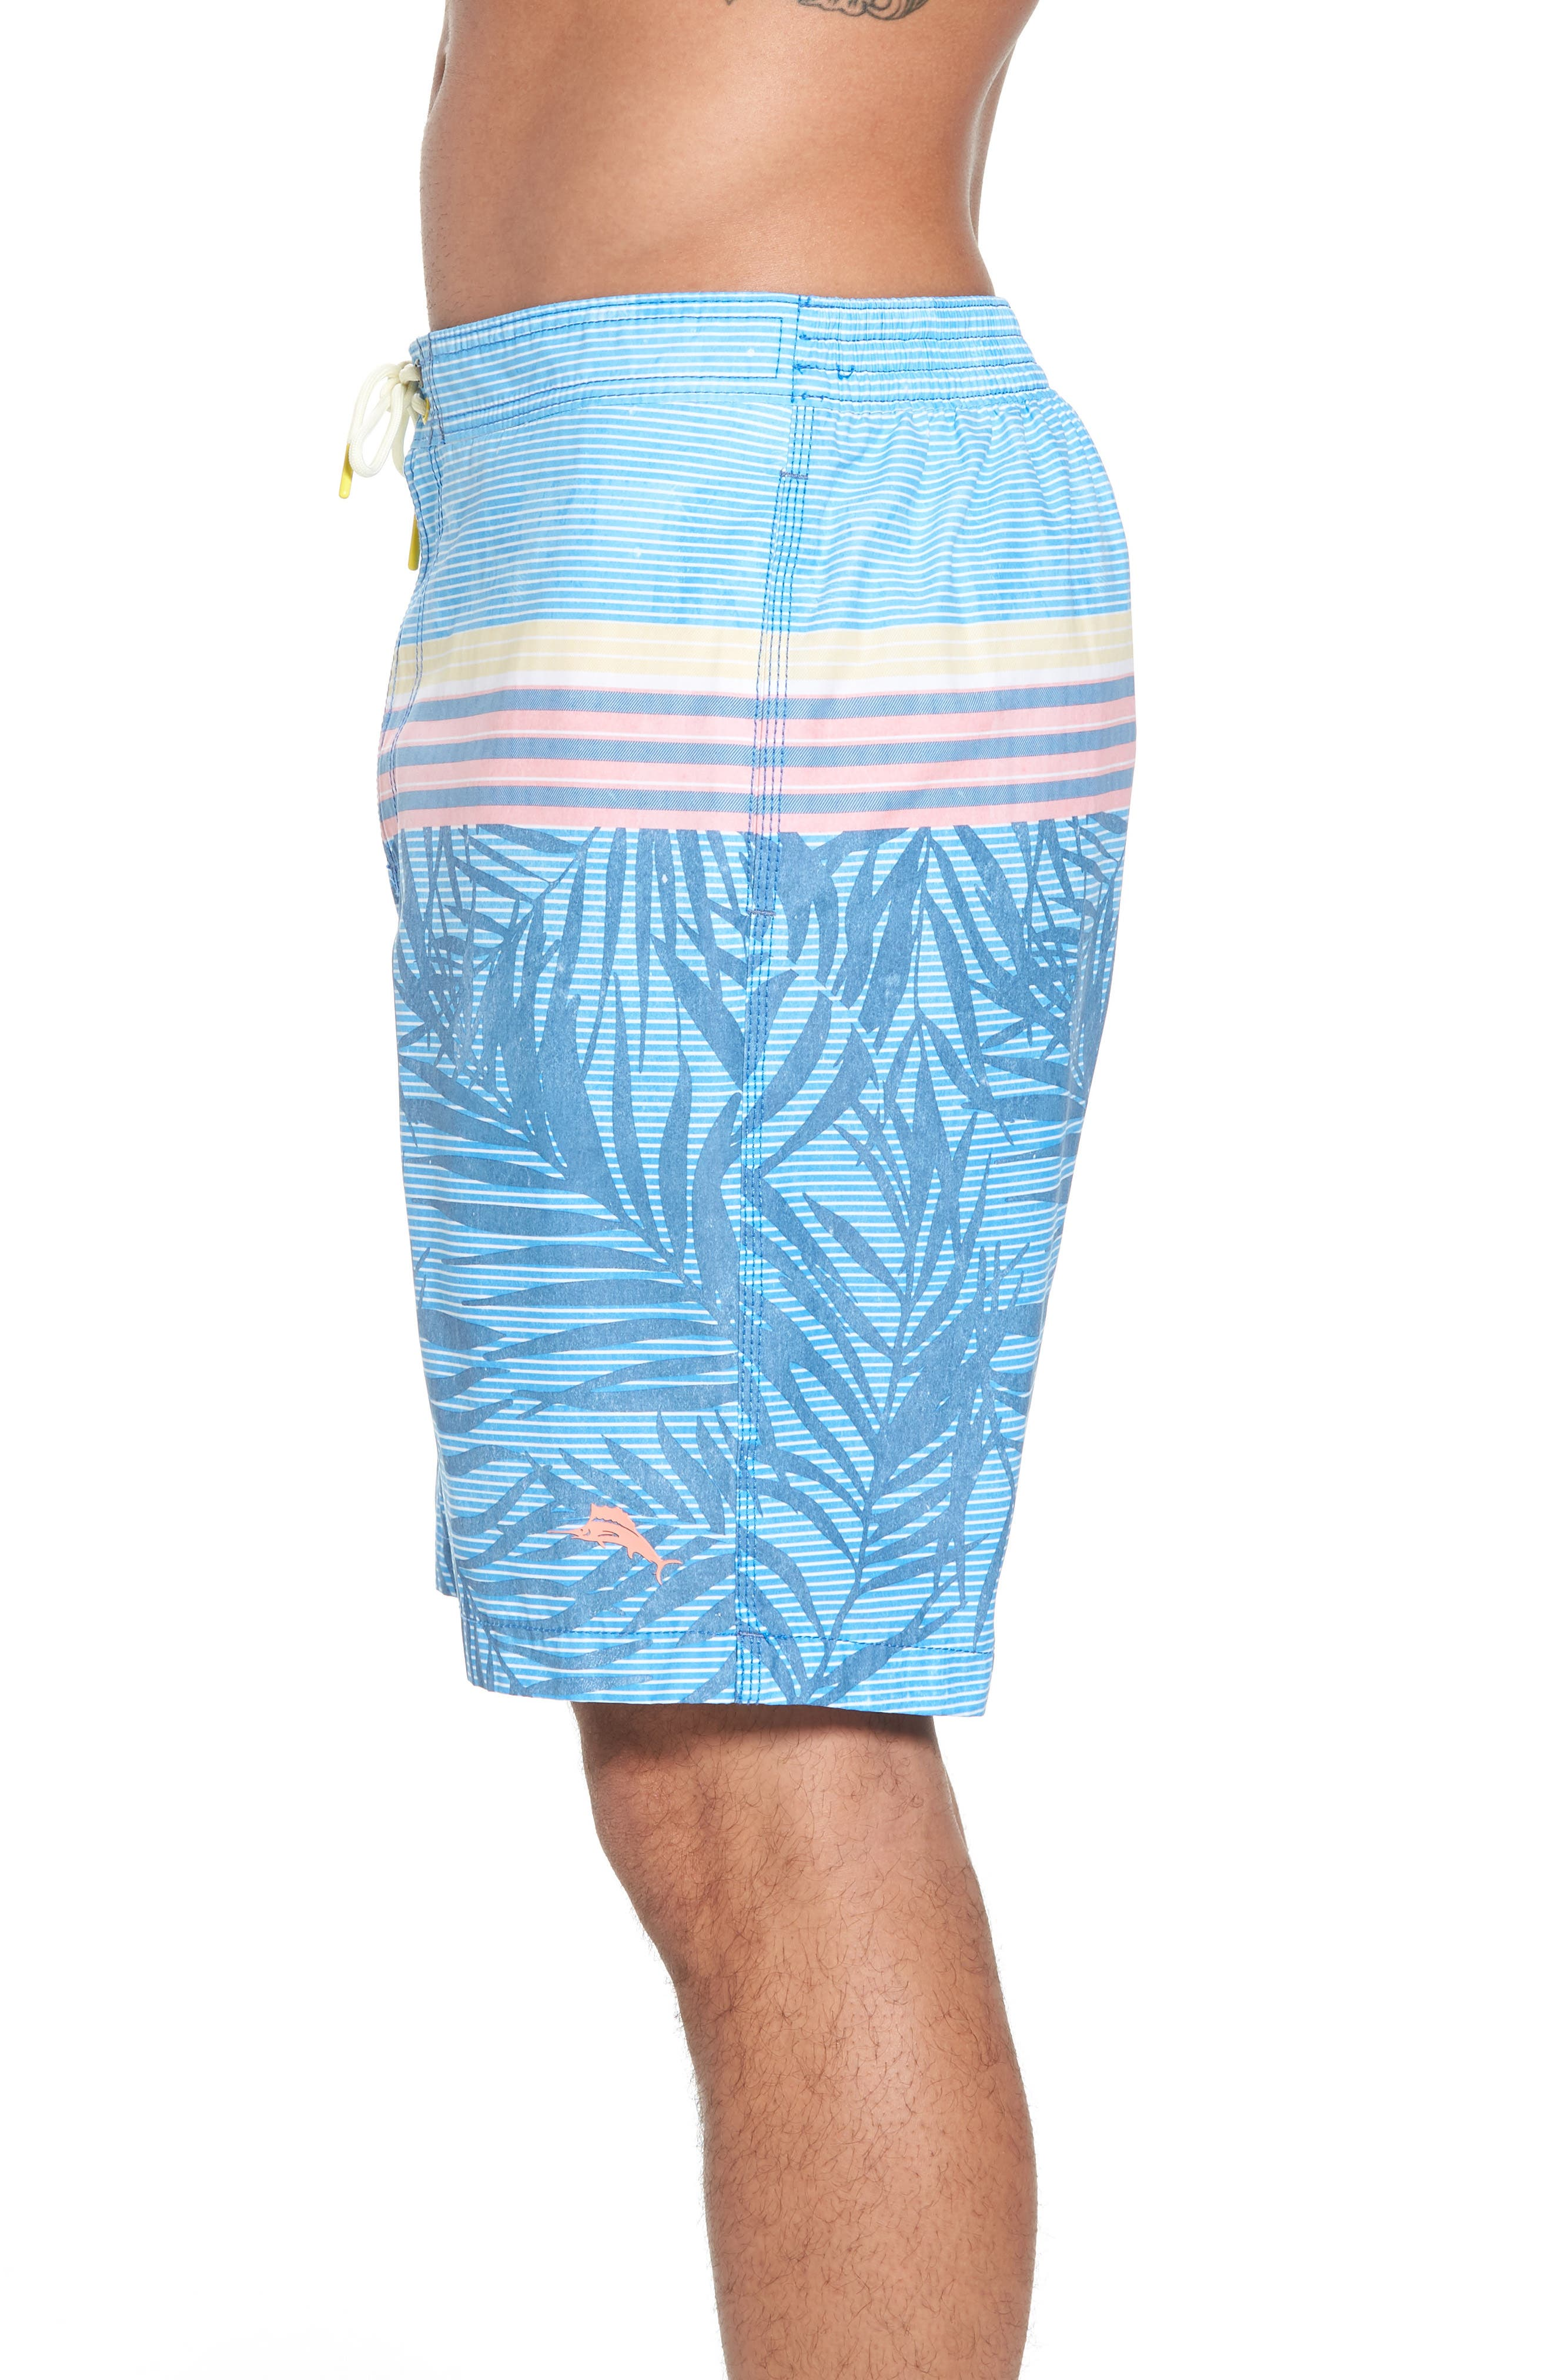 TOMMY BAHAMA,                             Baja Fronds & Stripes Board Shorts,                             Alternate thumbnail 3, color,                             400